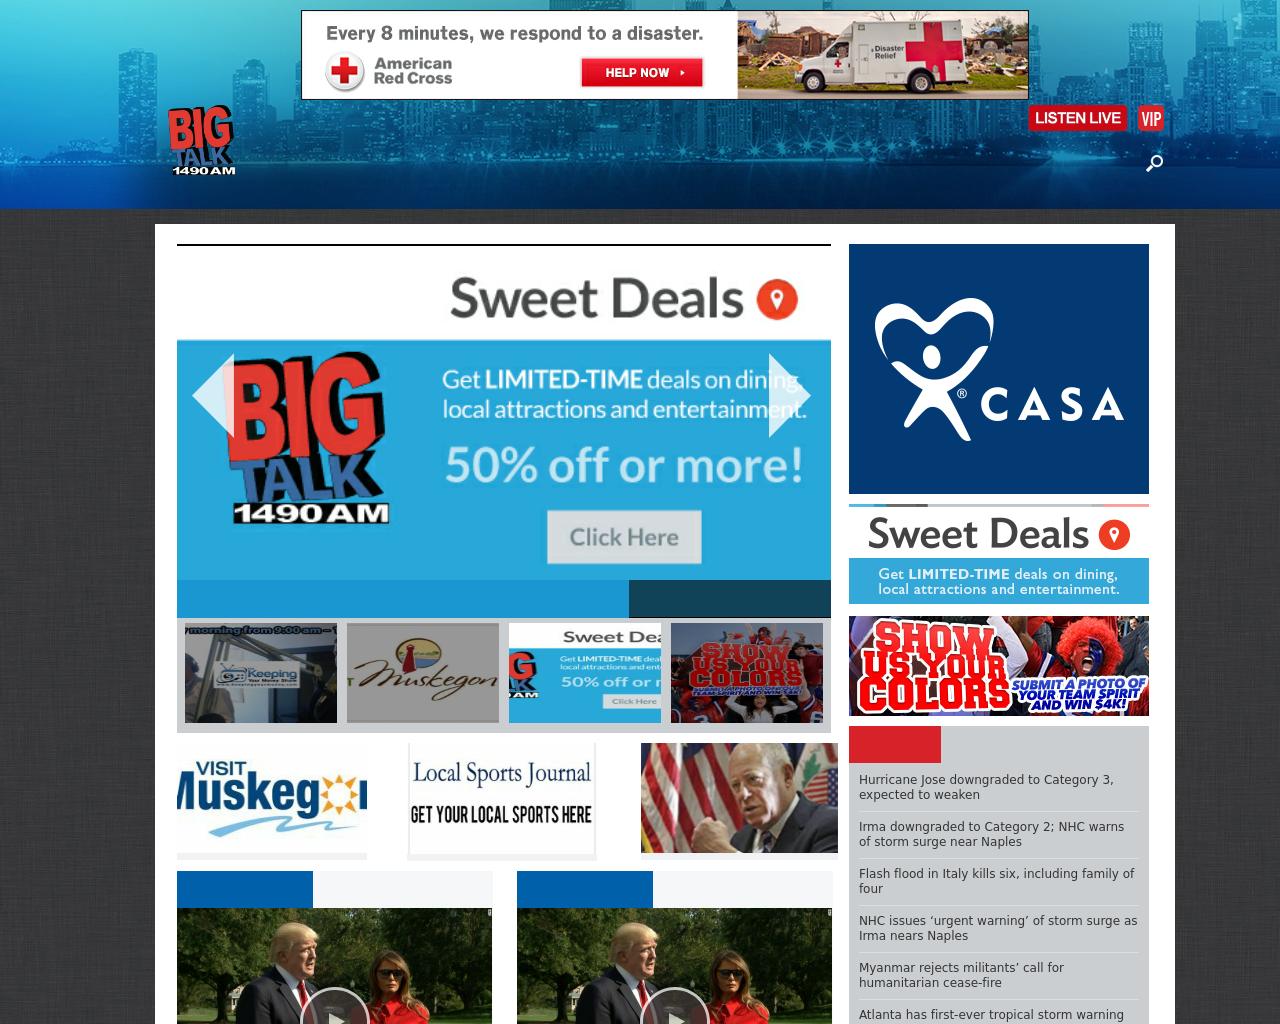 Big-Talk-1490-AM-Advertising-Reviews-Pricing